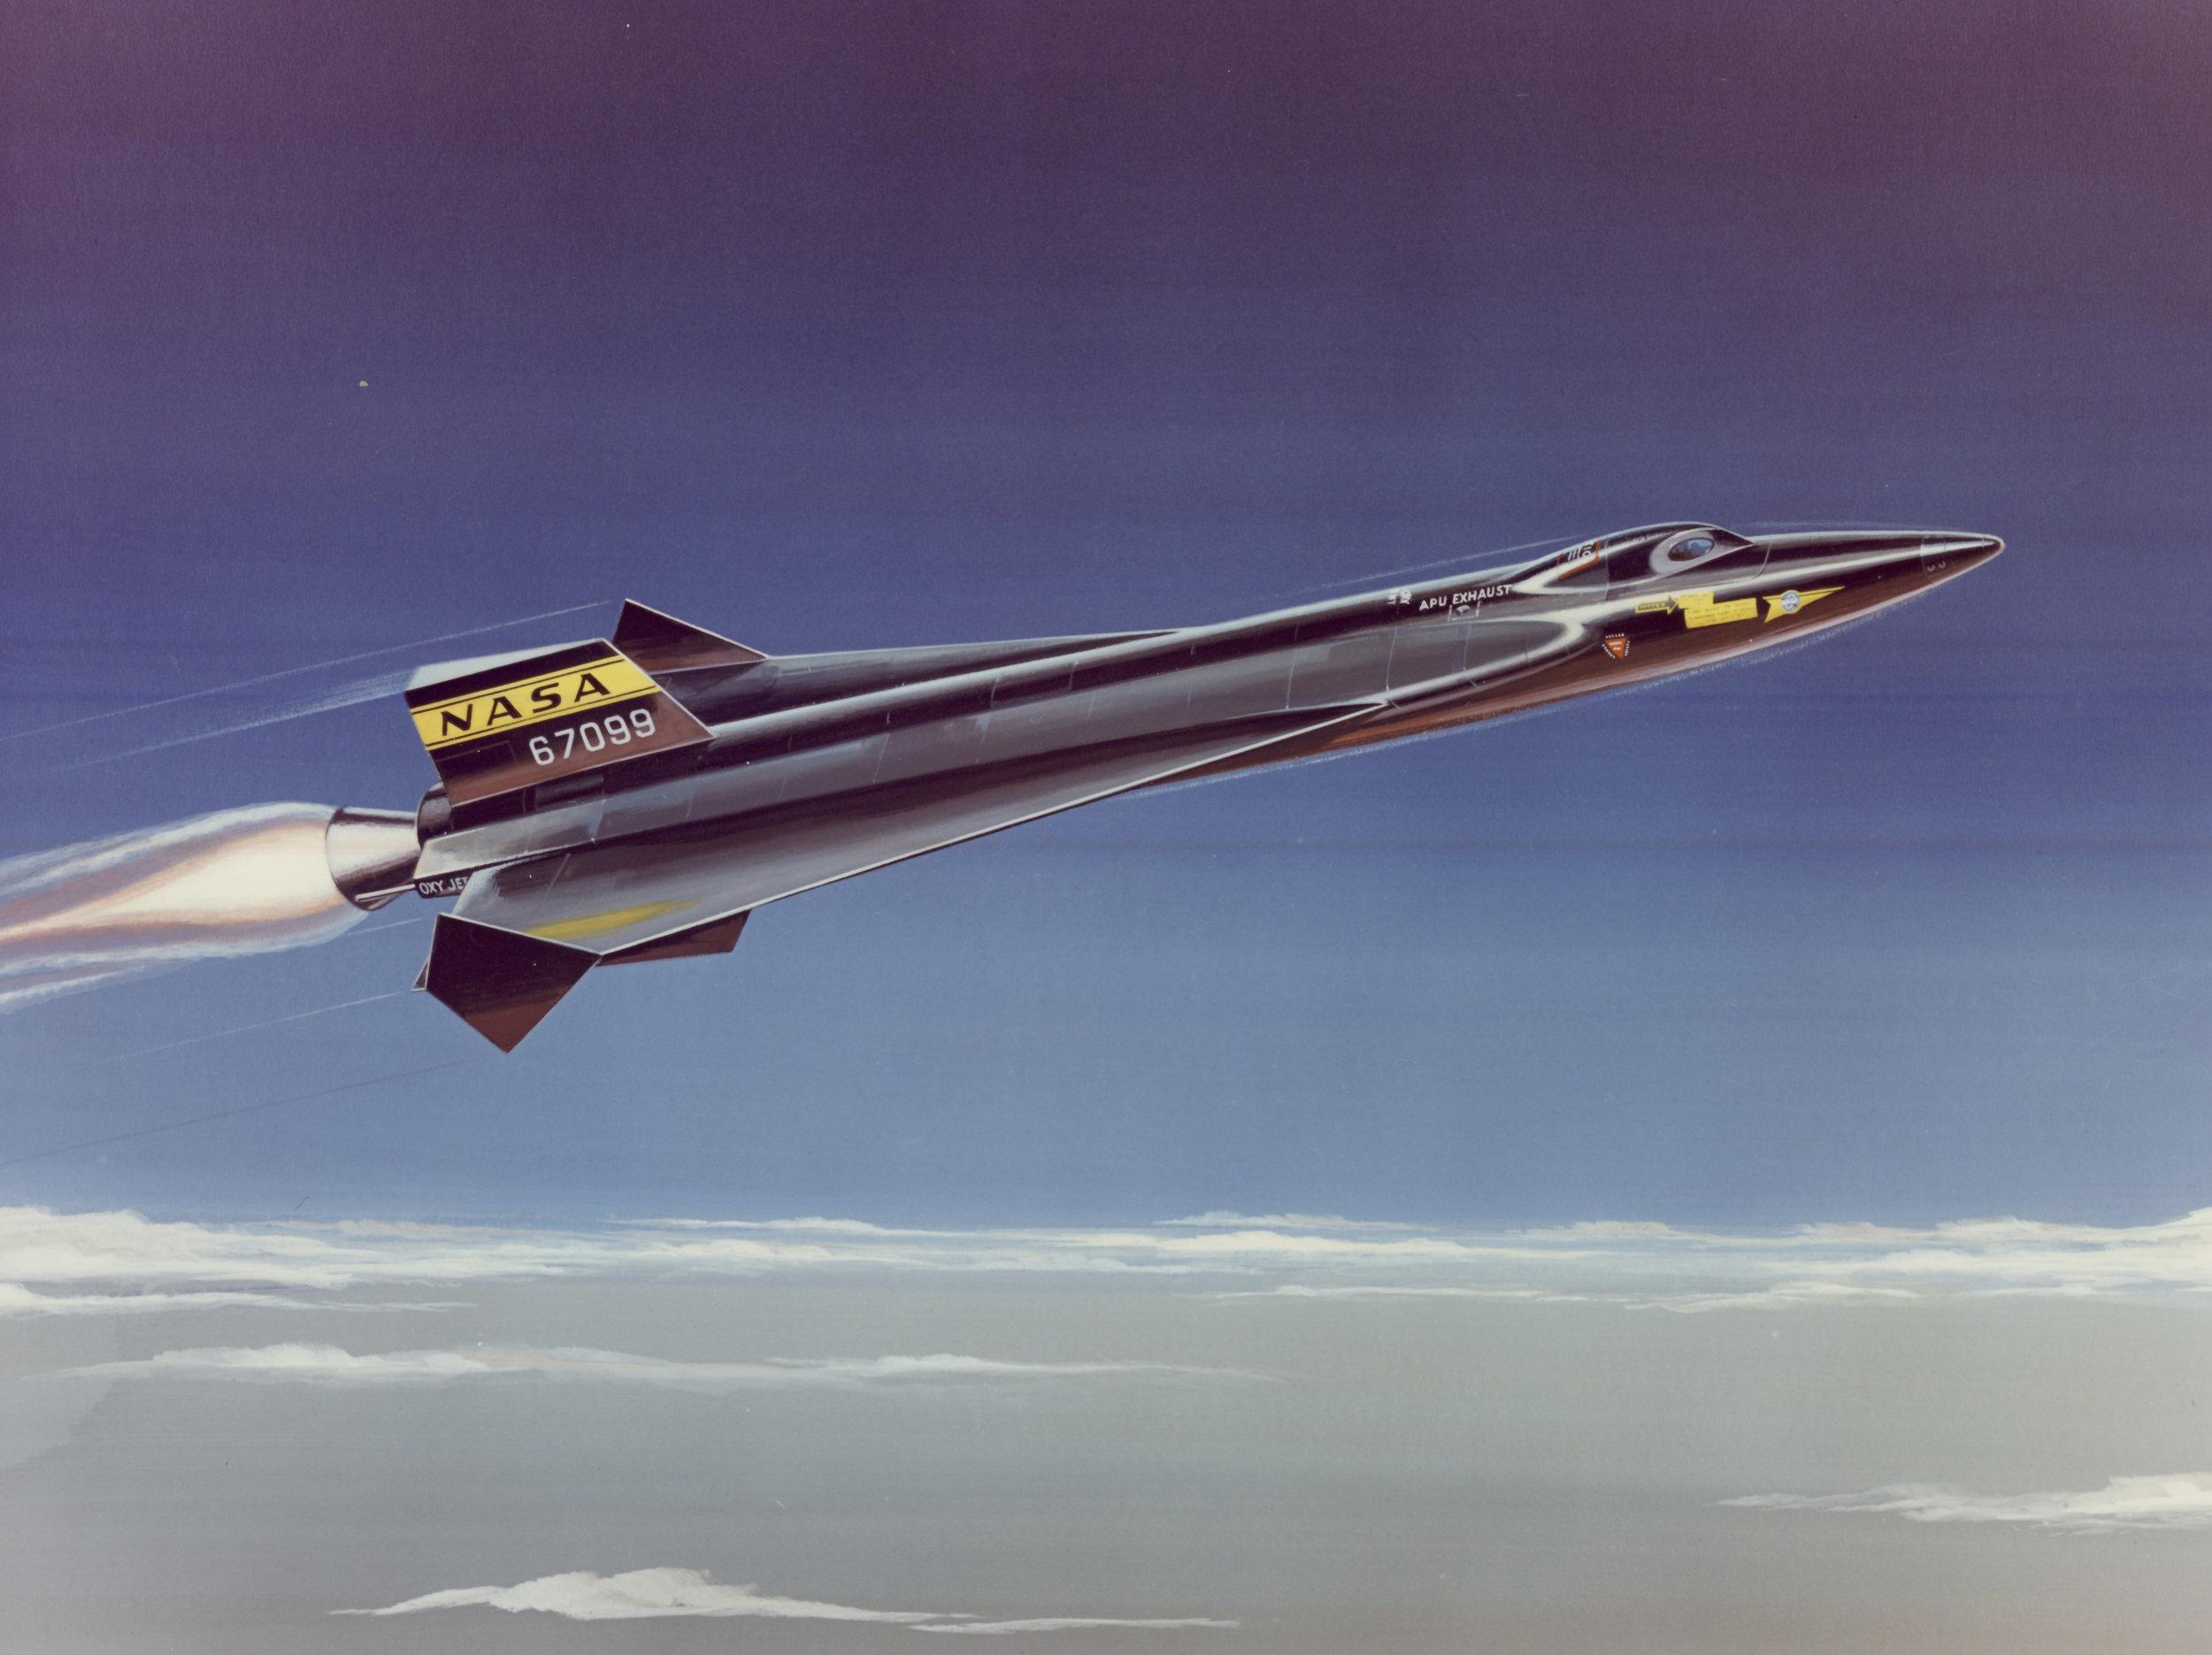 NAA delta wing X-15 concept